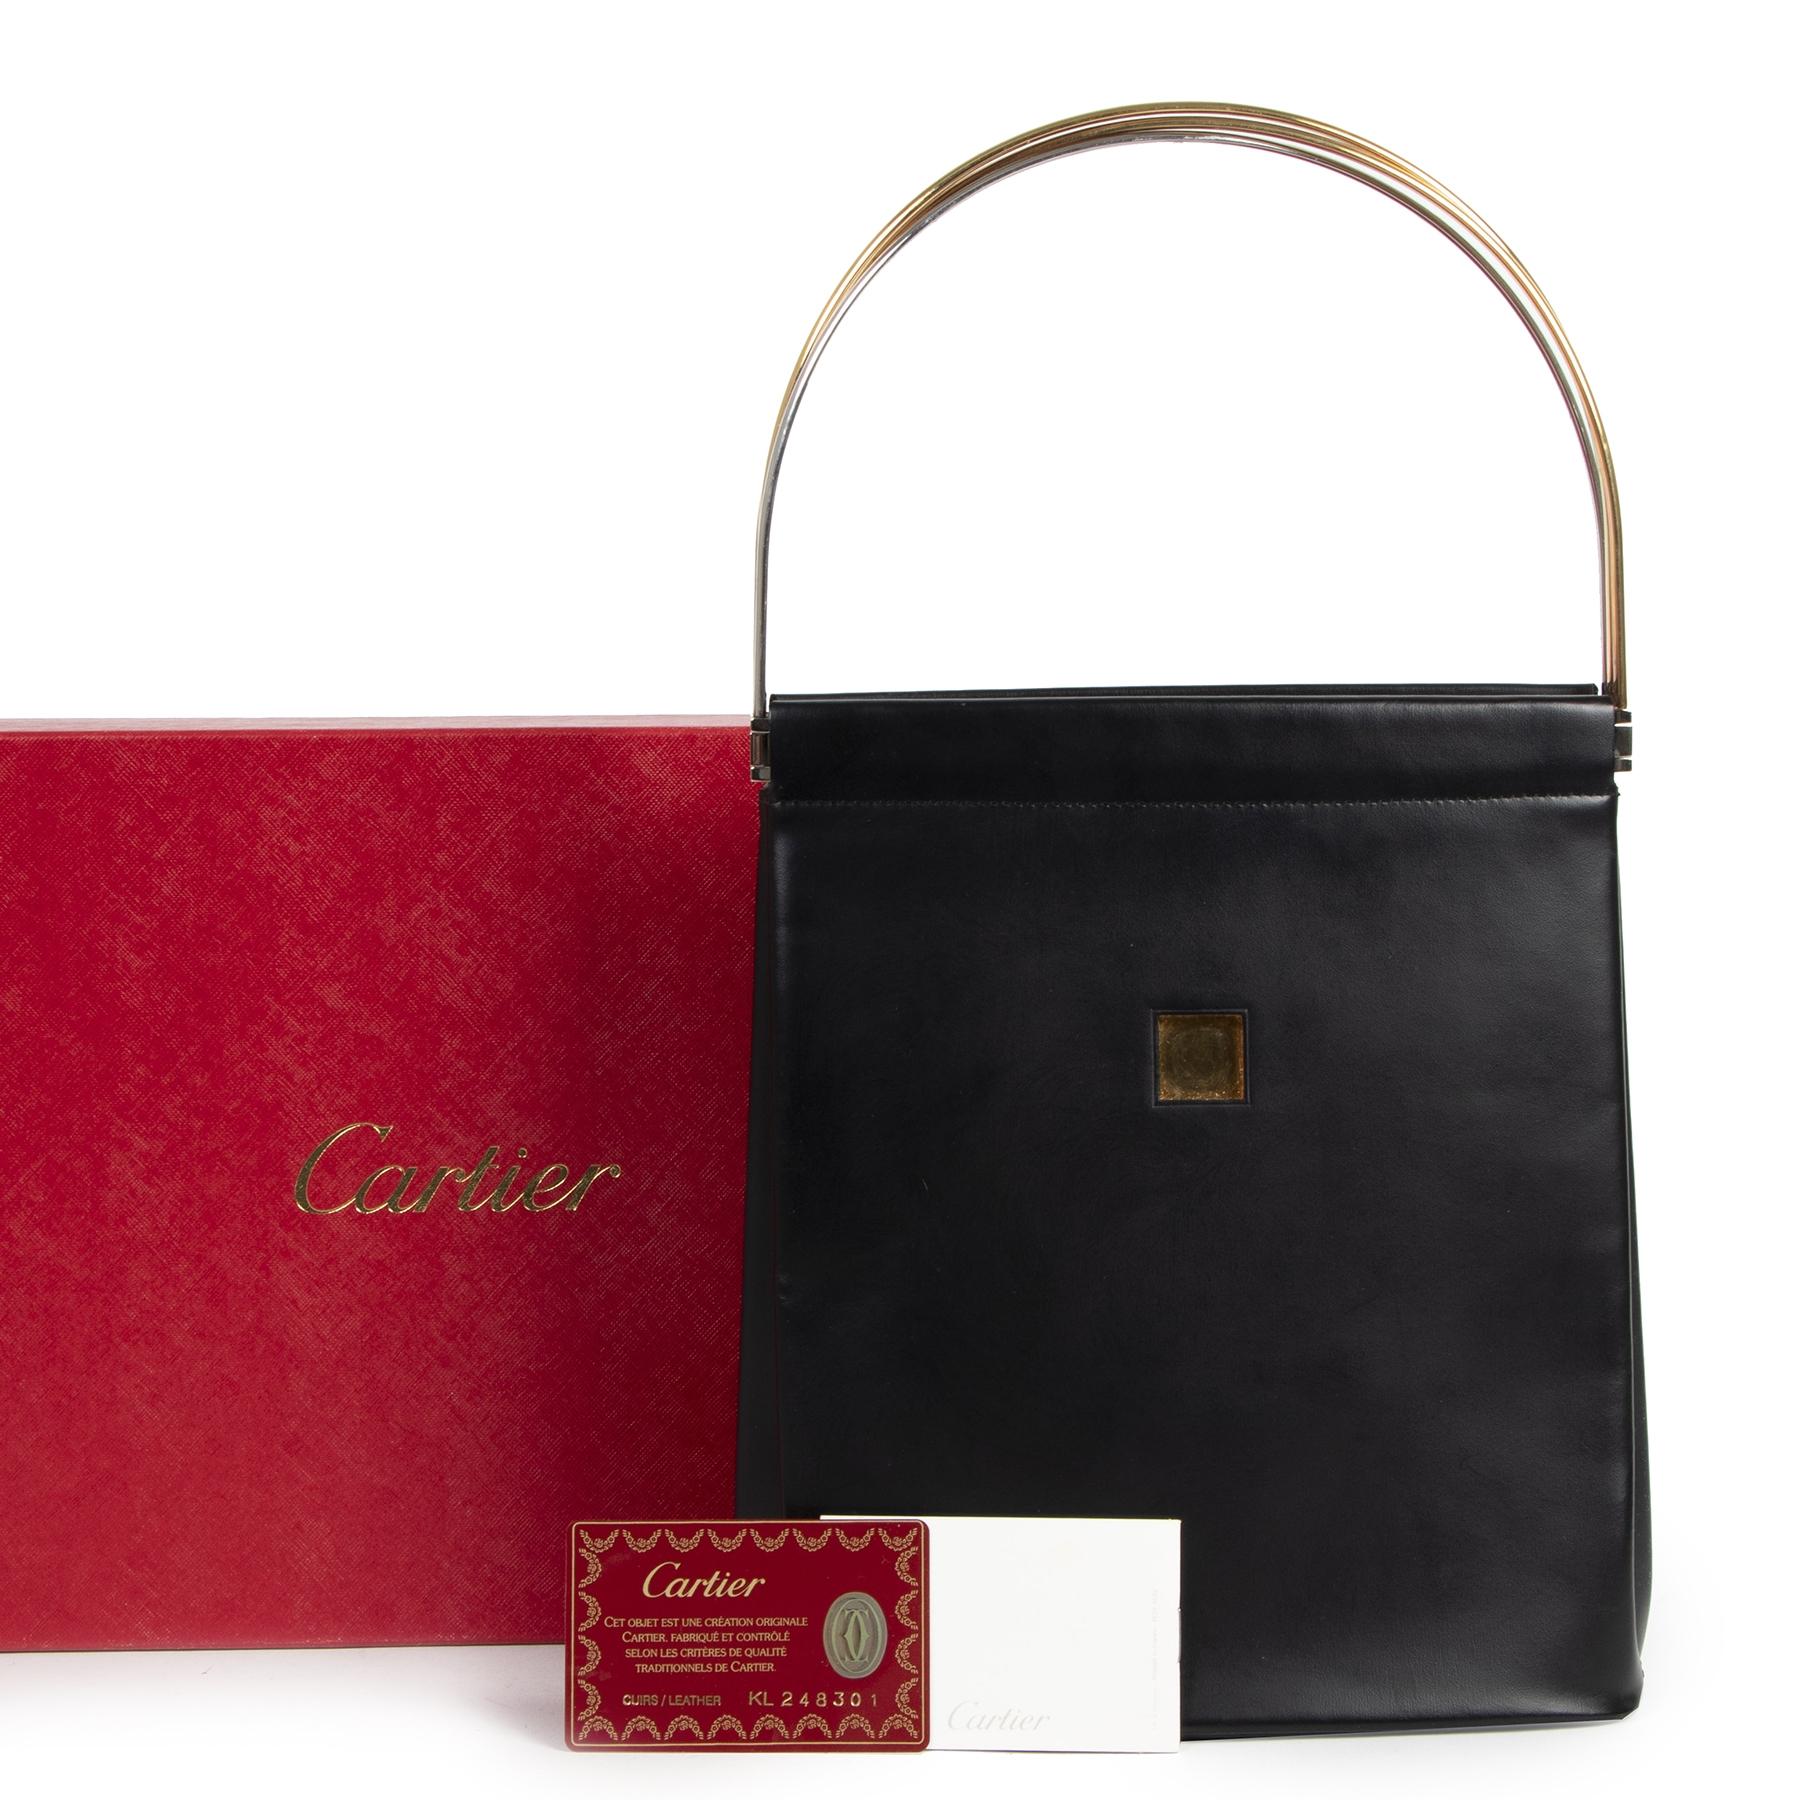 Authentic second-hand vintage Cartier Trinity Black Leather Top Handle Bag buy online webshop LabelLOV